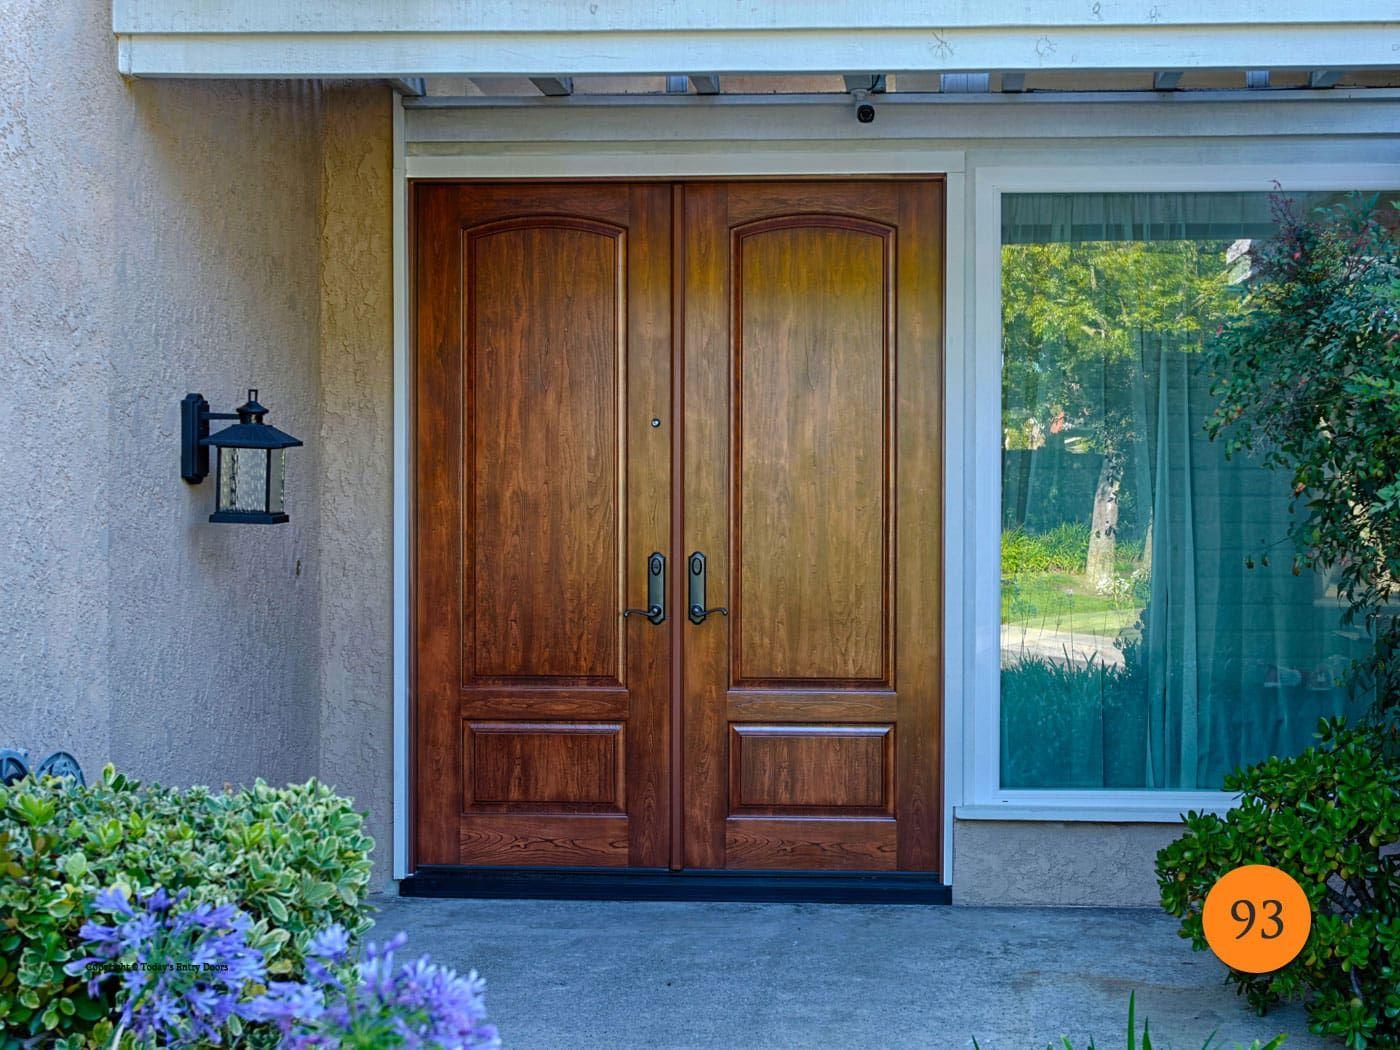 8 Foot Entry Doors 96 Tall Fiberglass Todays Entry Doors Double Doors Exterior Exterior Front Doors Double Front Doors